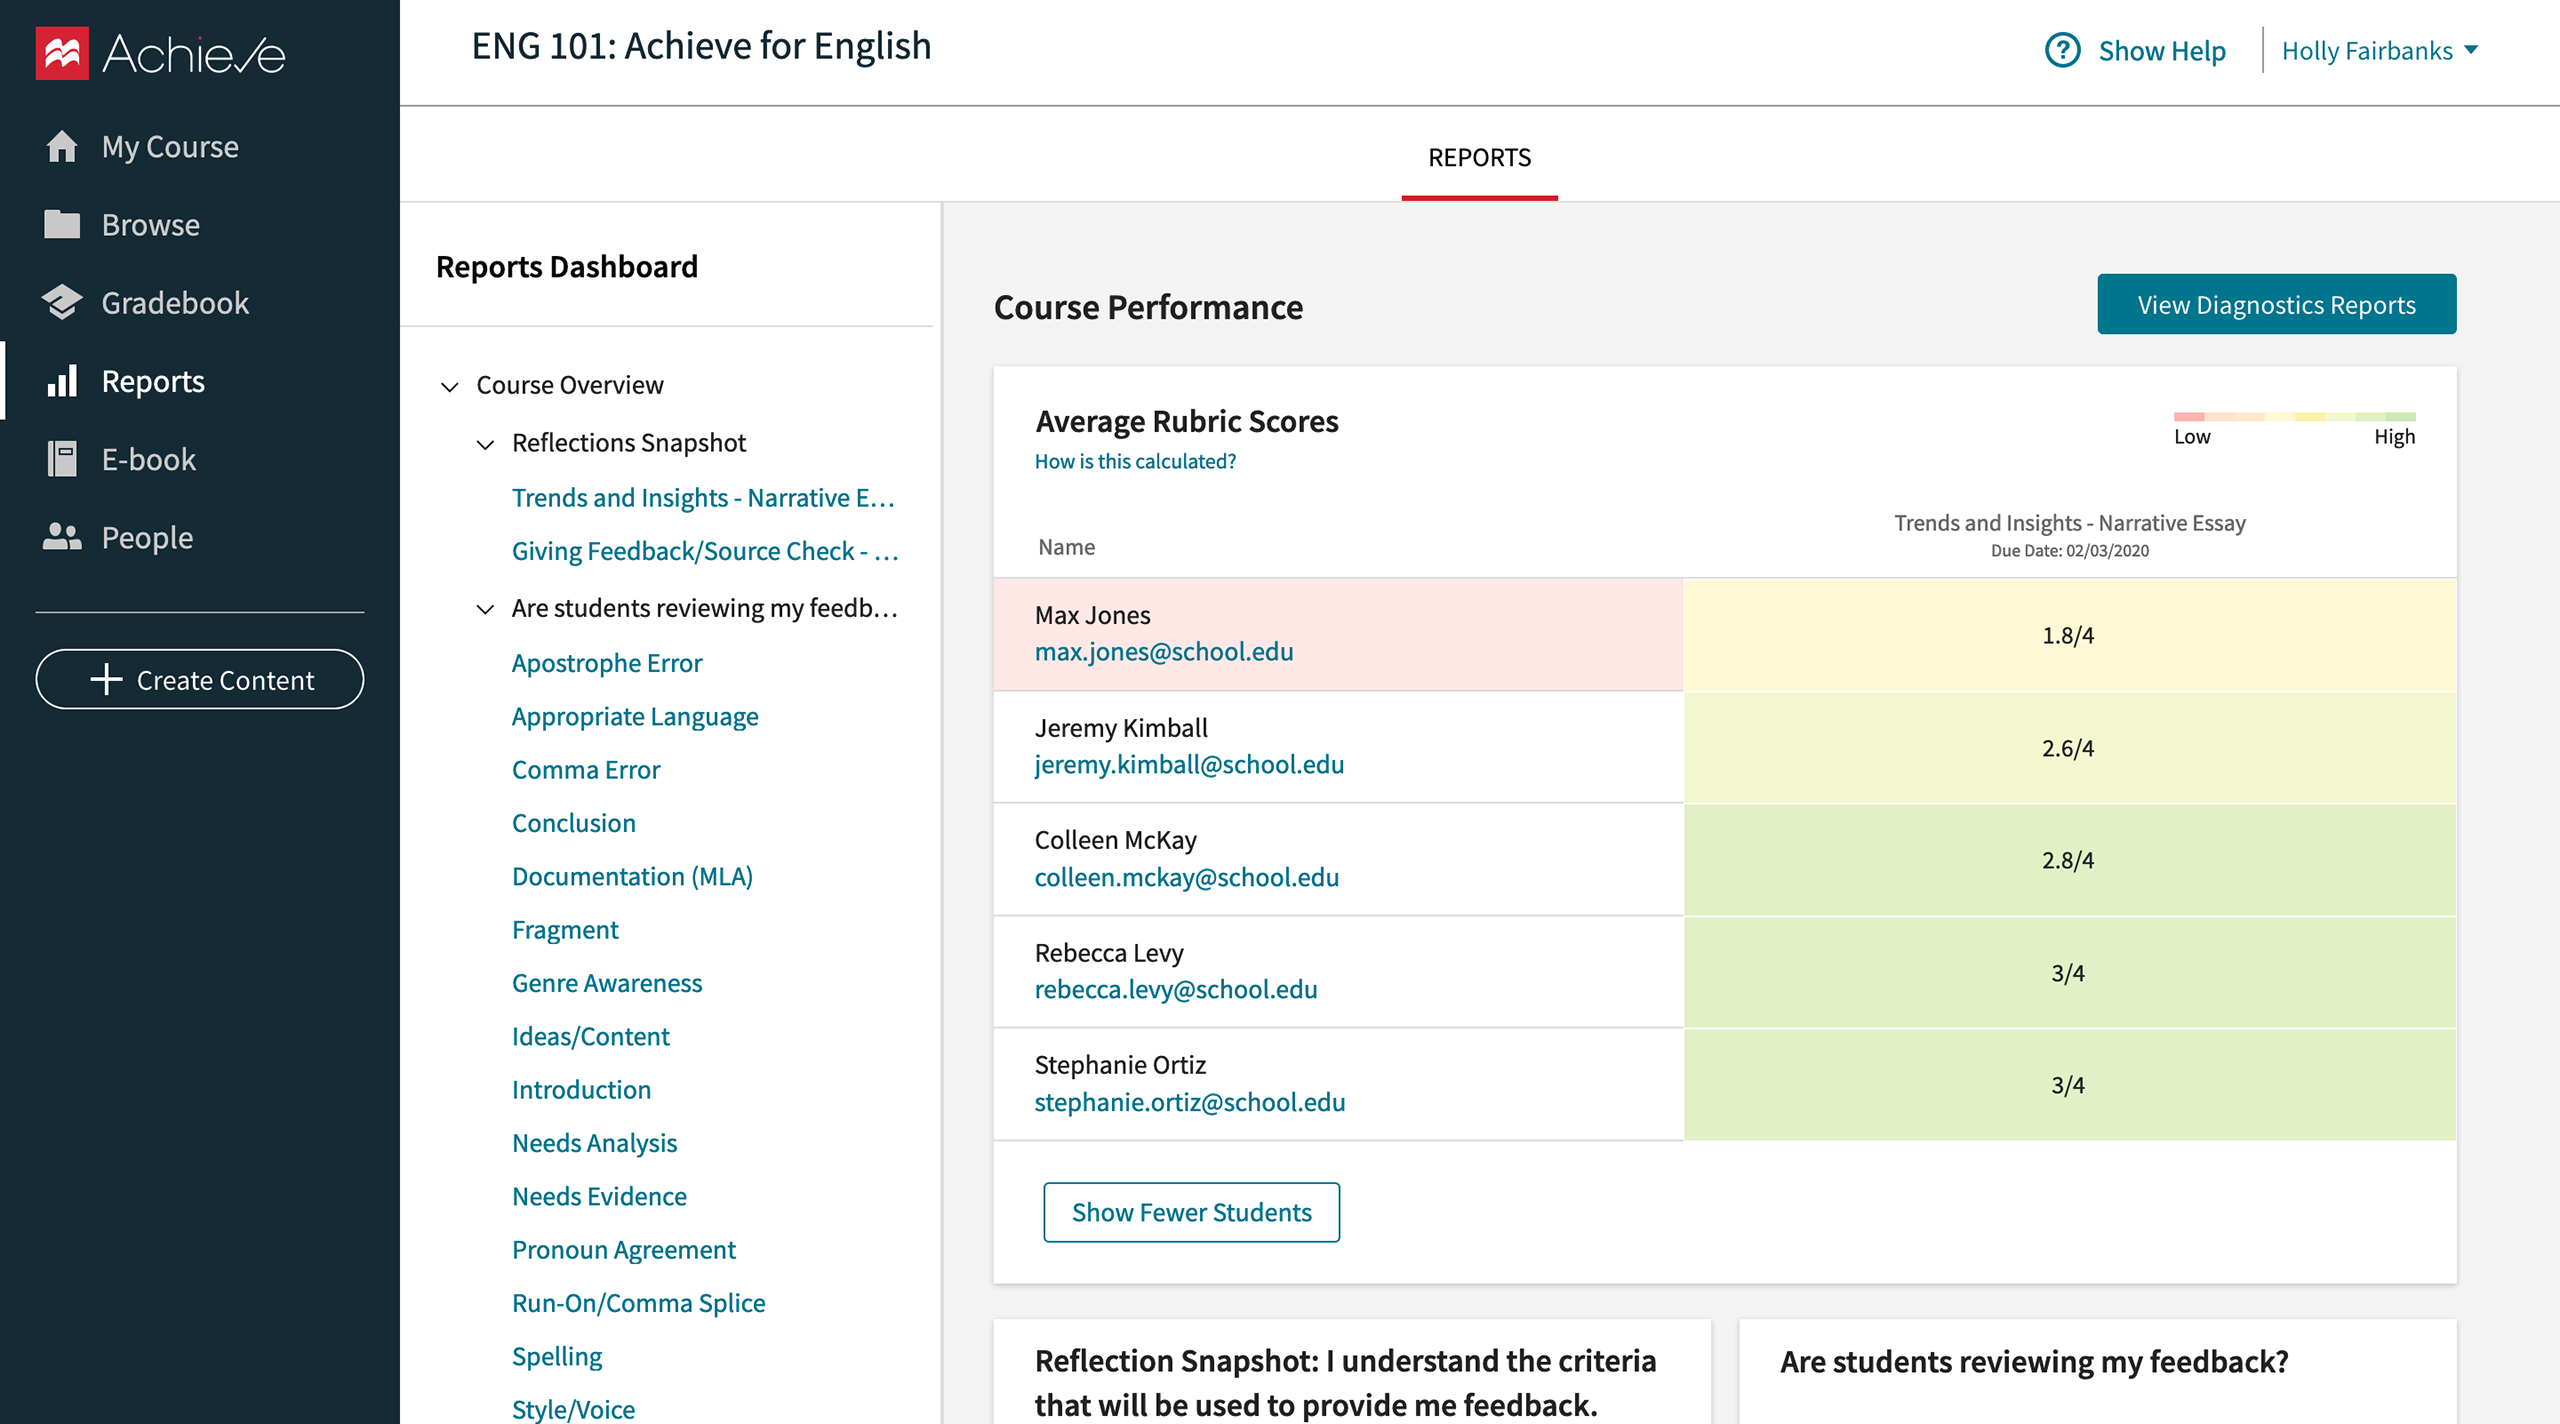 achieve reports